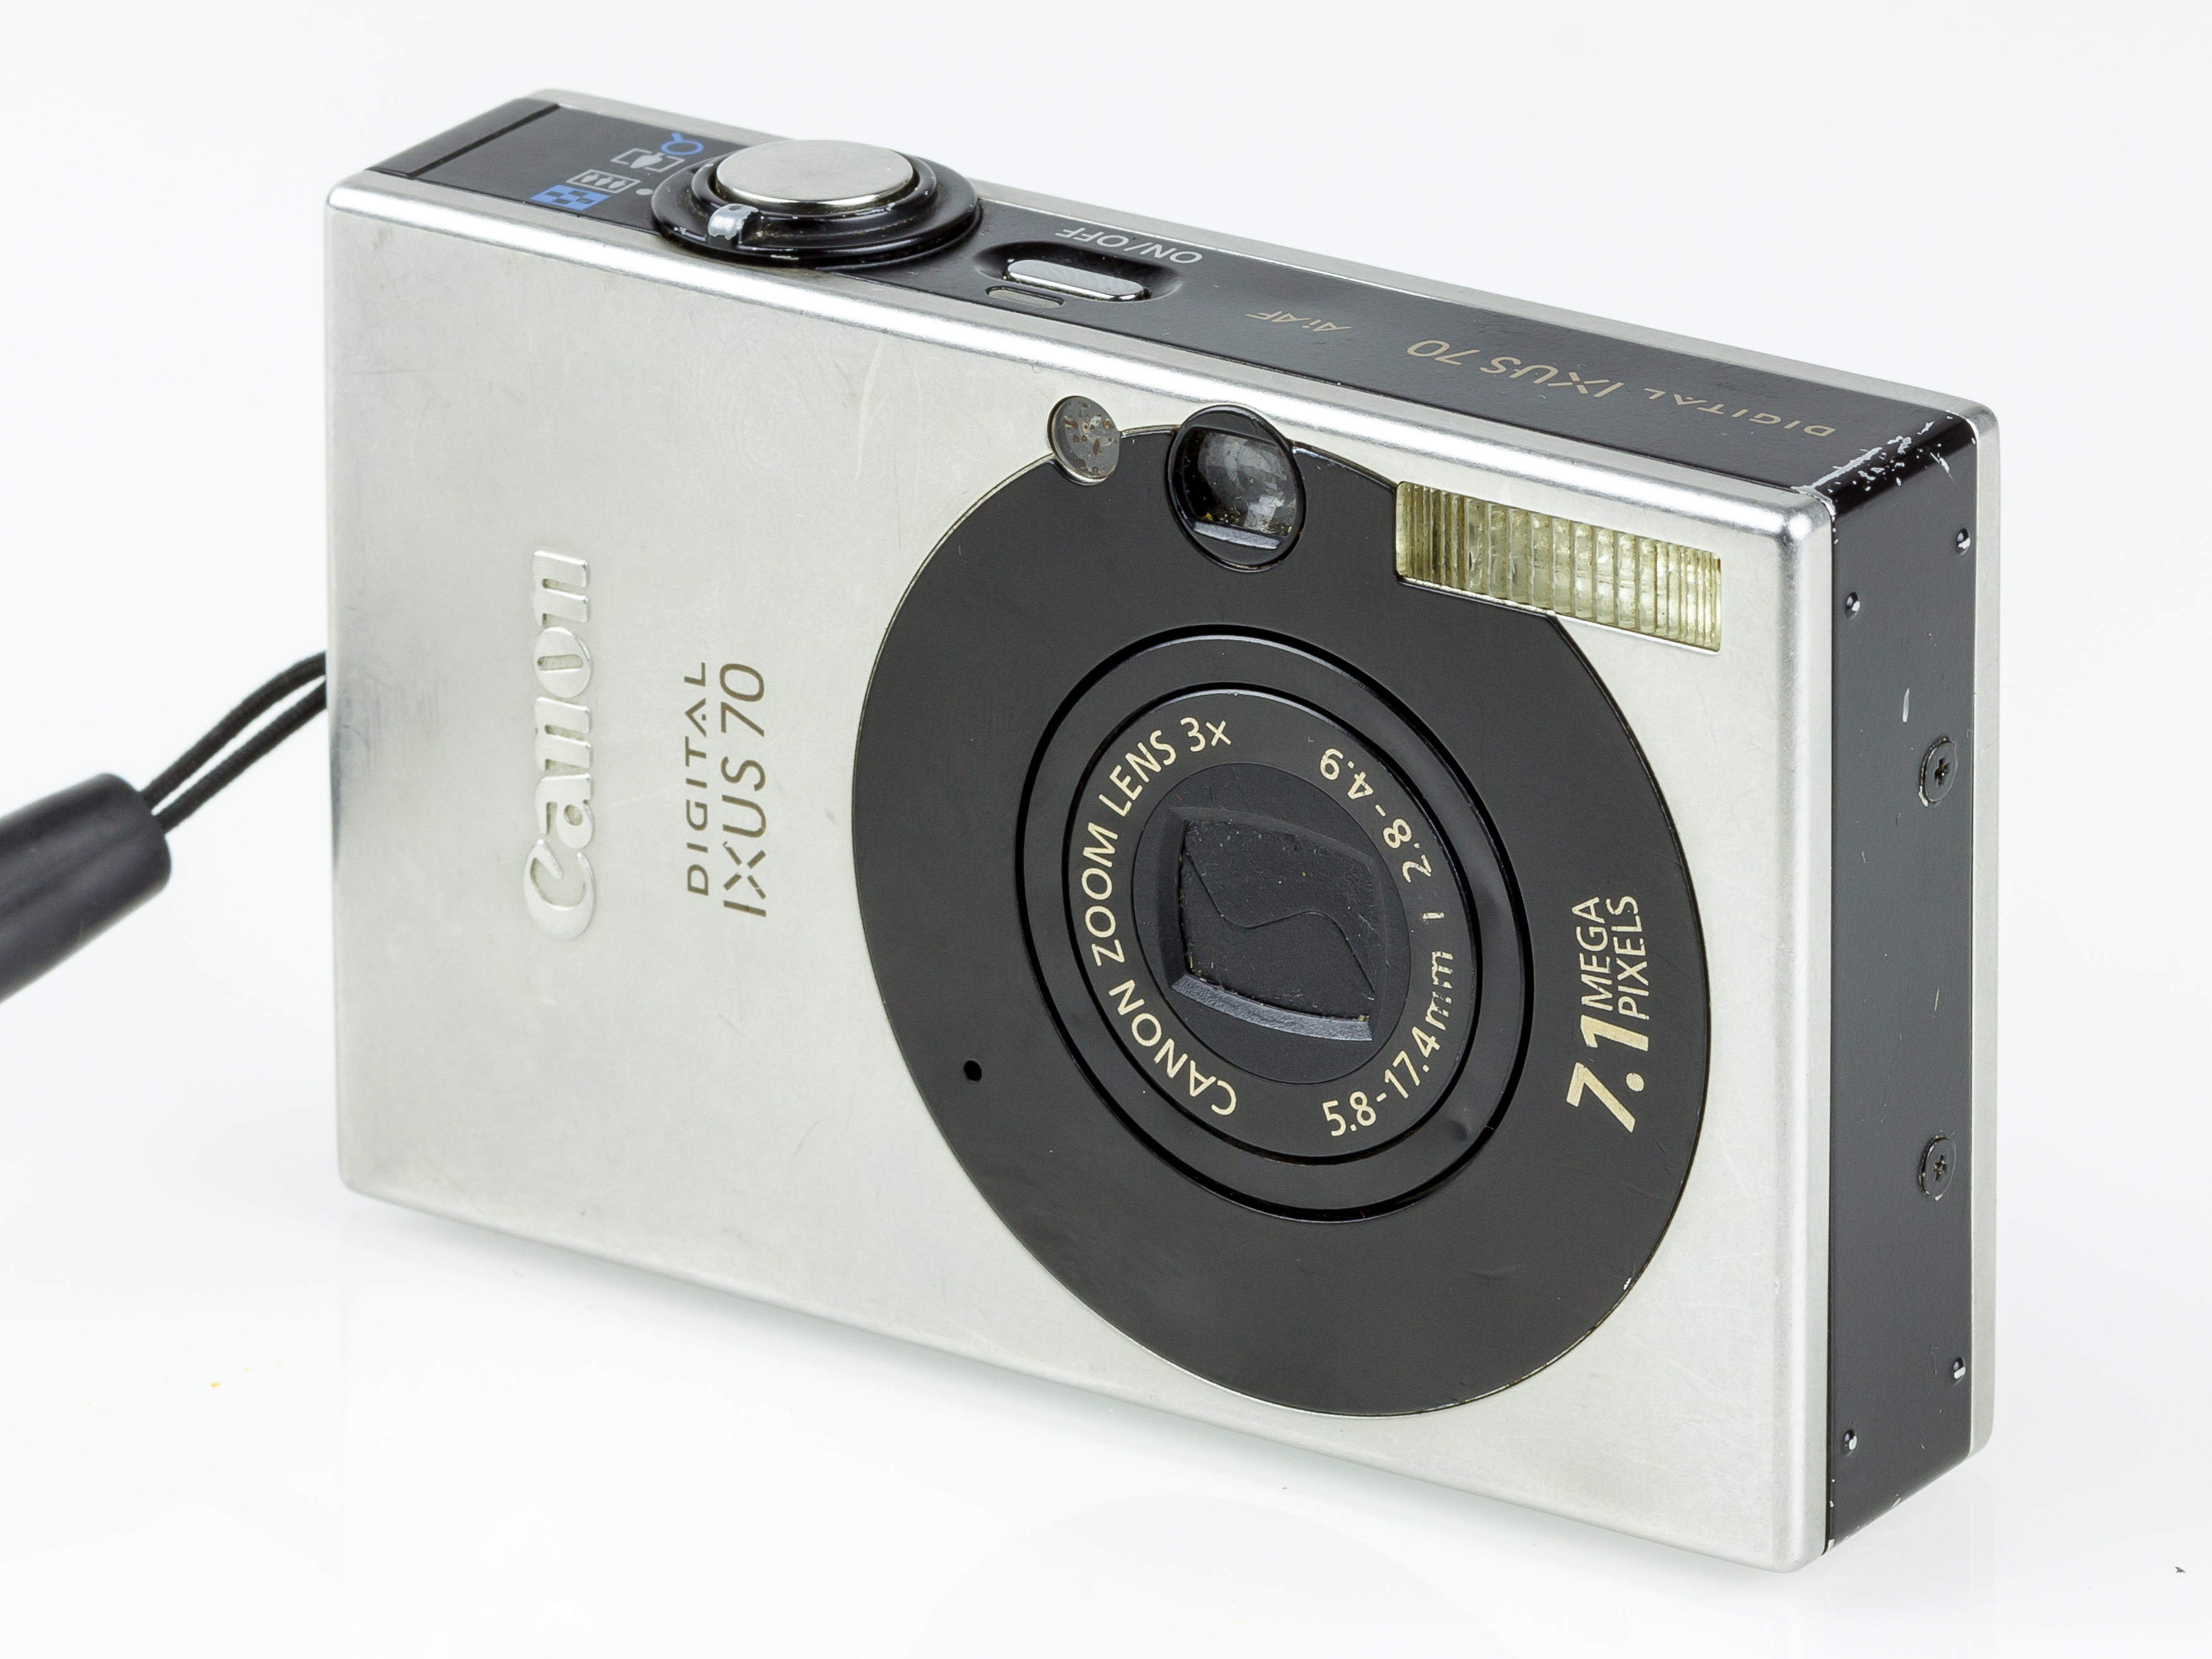 file canon digital ixus 70 front 4307 jpg wikimedia commons rh commons wikimedia org Digital Camera Microphone Digital Camera Mounting Bracket